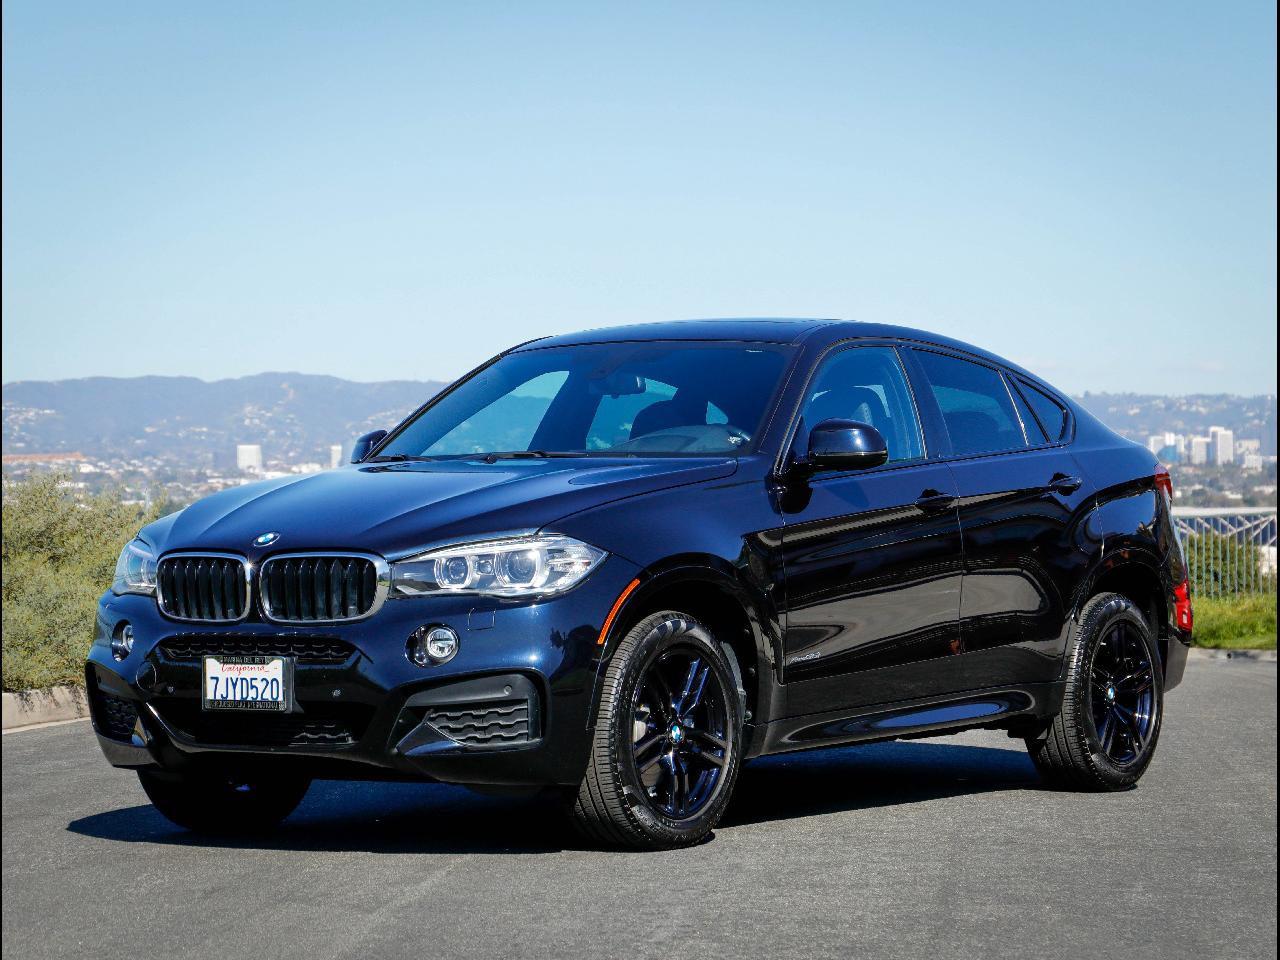 2015 BMW X6 M Sport xDrive